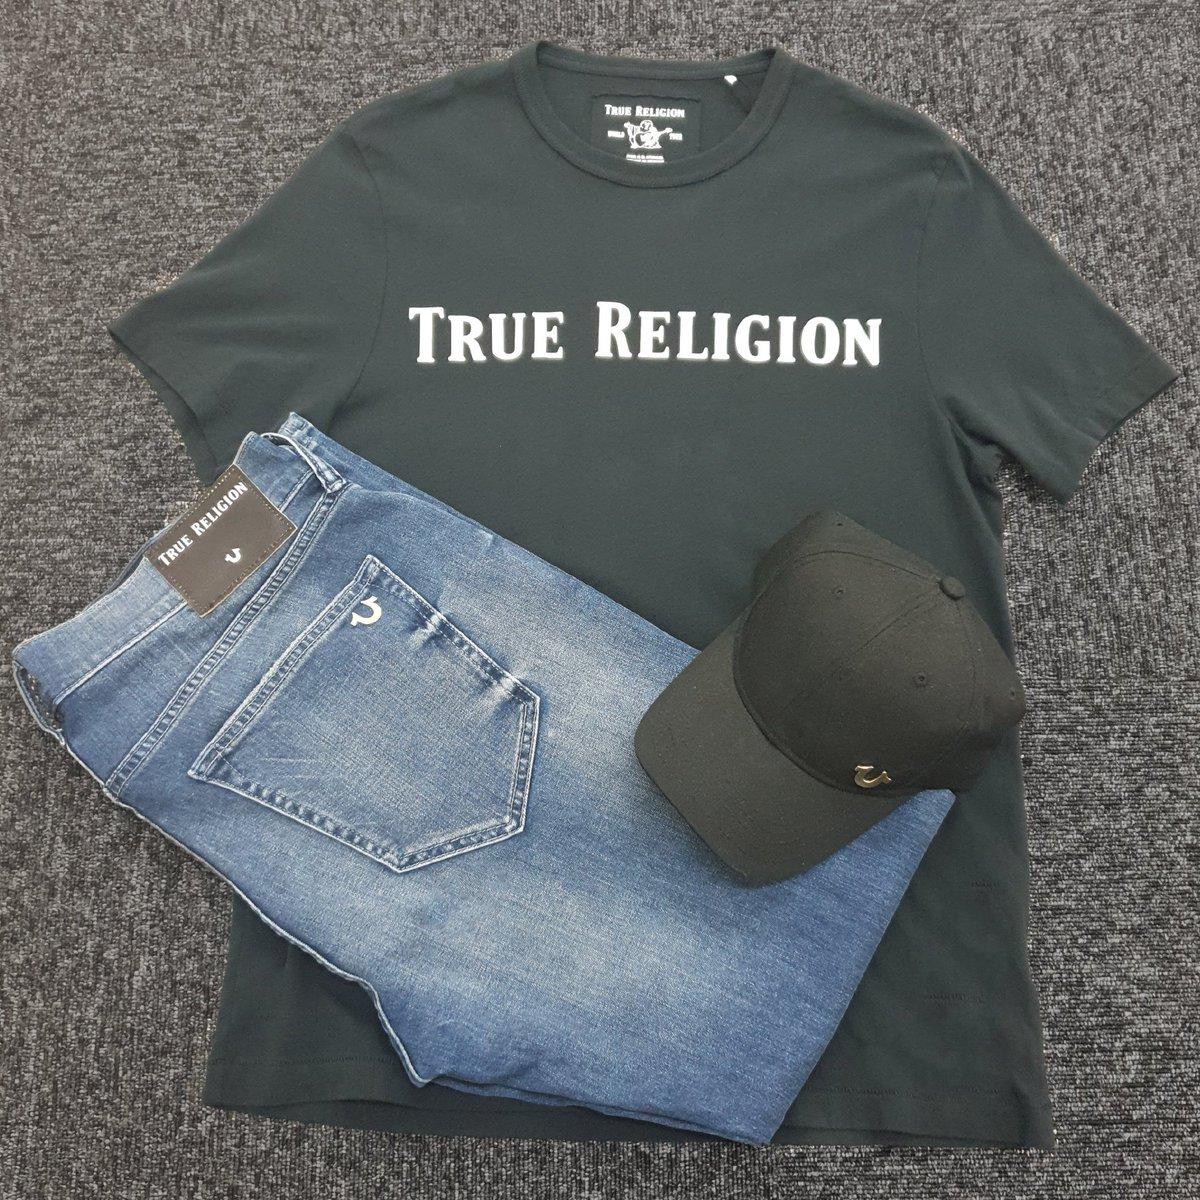 7a59cfa77 truereligion hashtag on Twitter